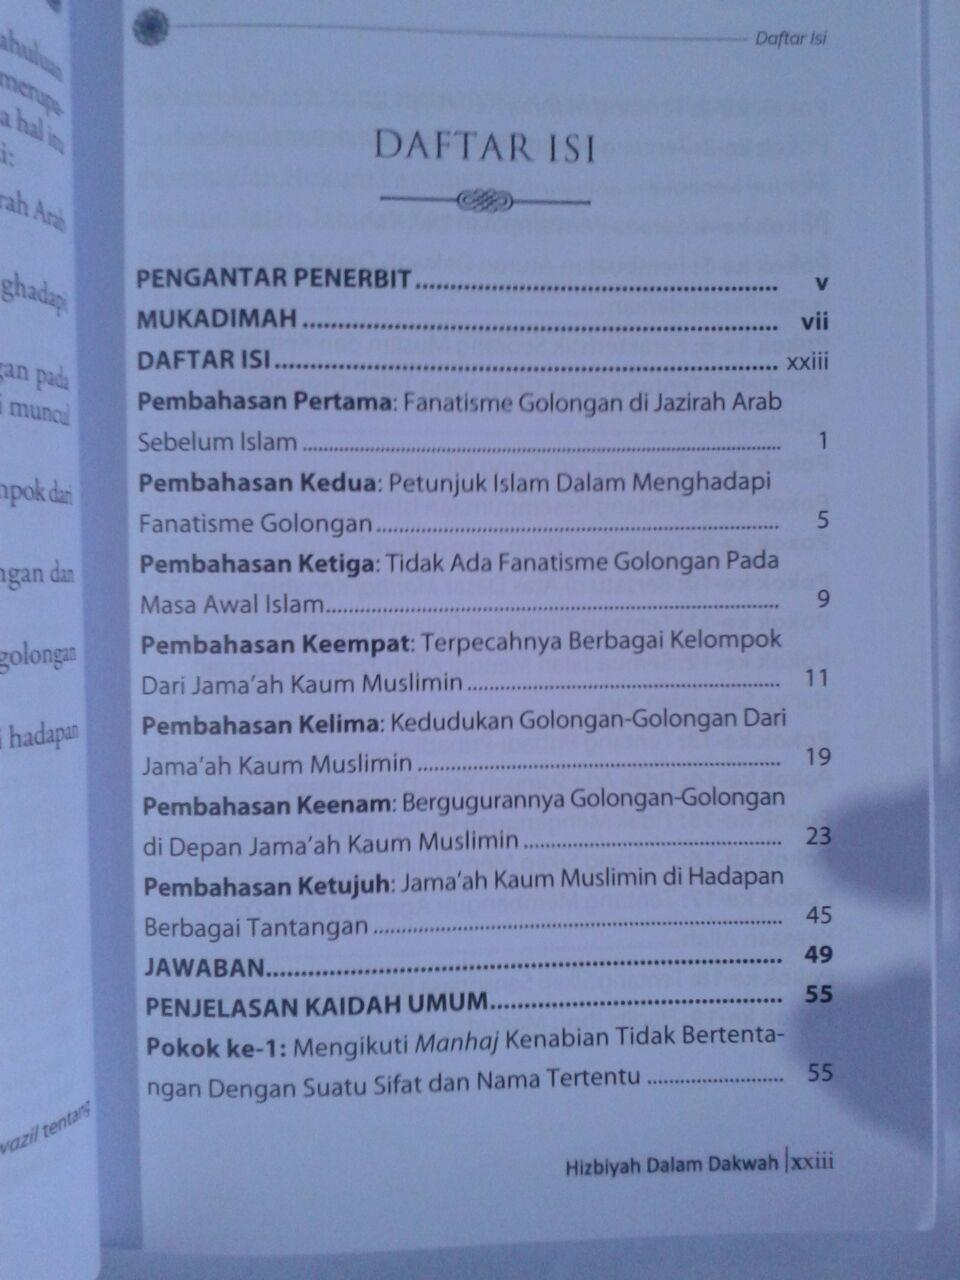 Buku Perlukan Hizbiyah Dalam Dakwah isi 3